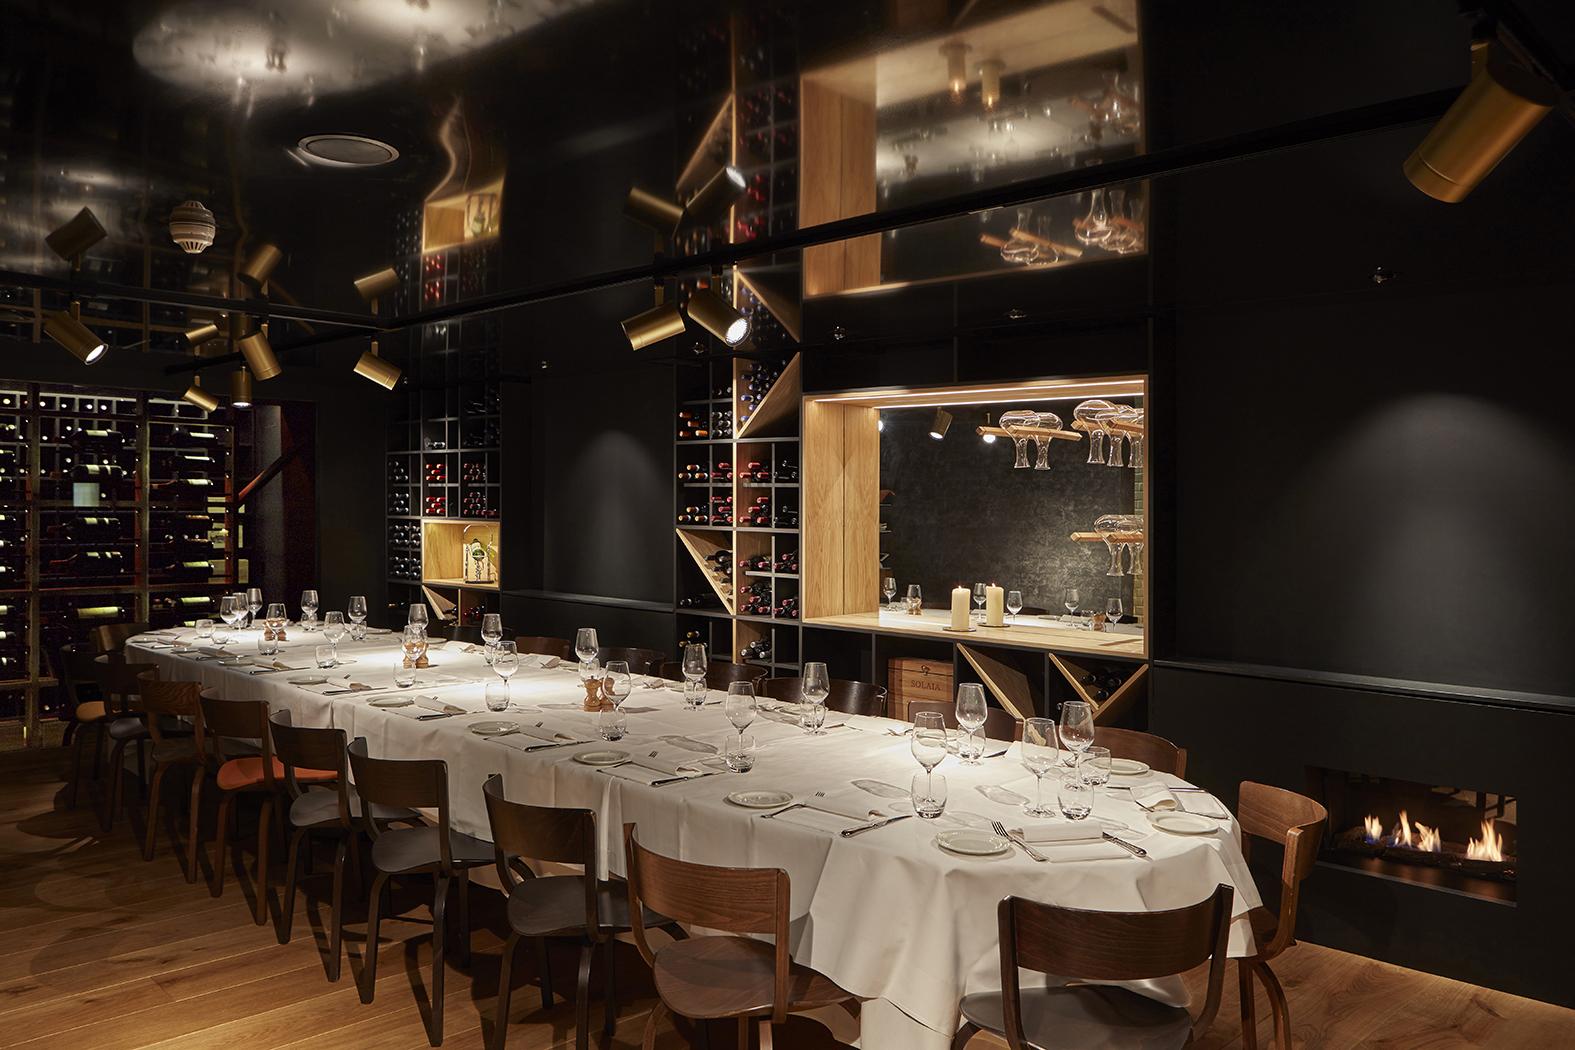 Italian Restaurants We Want To Go To - Enoteca Turi - Humphrey Munson Blog